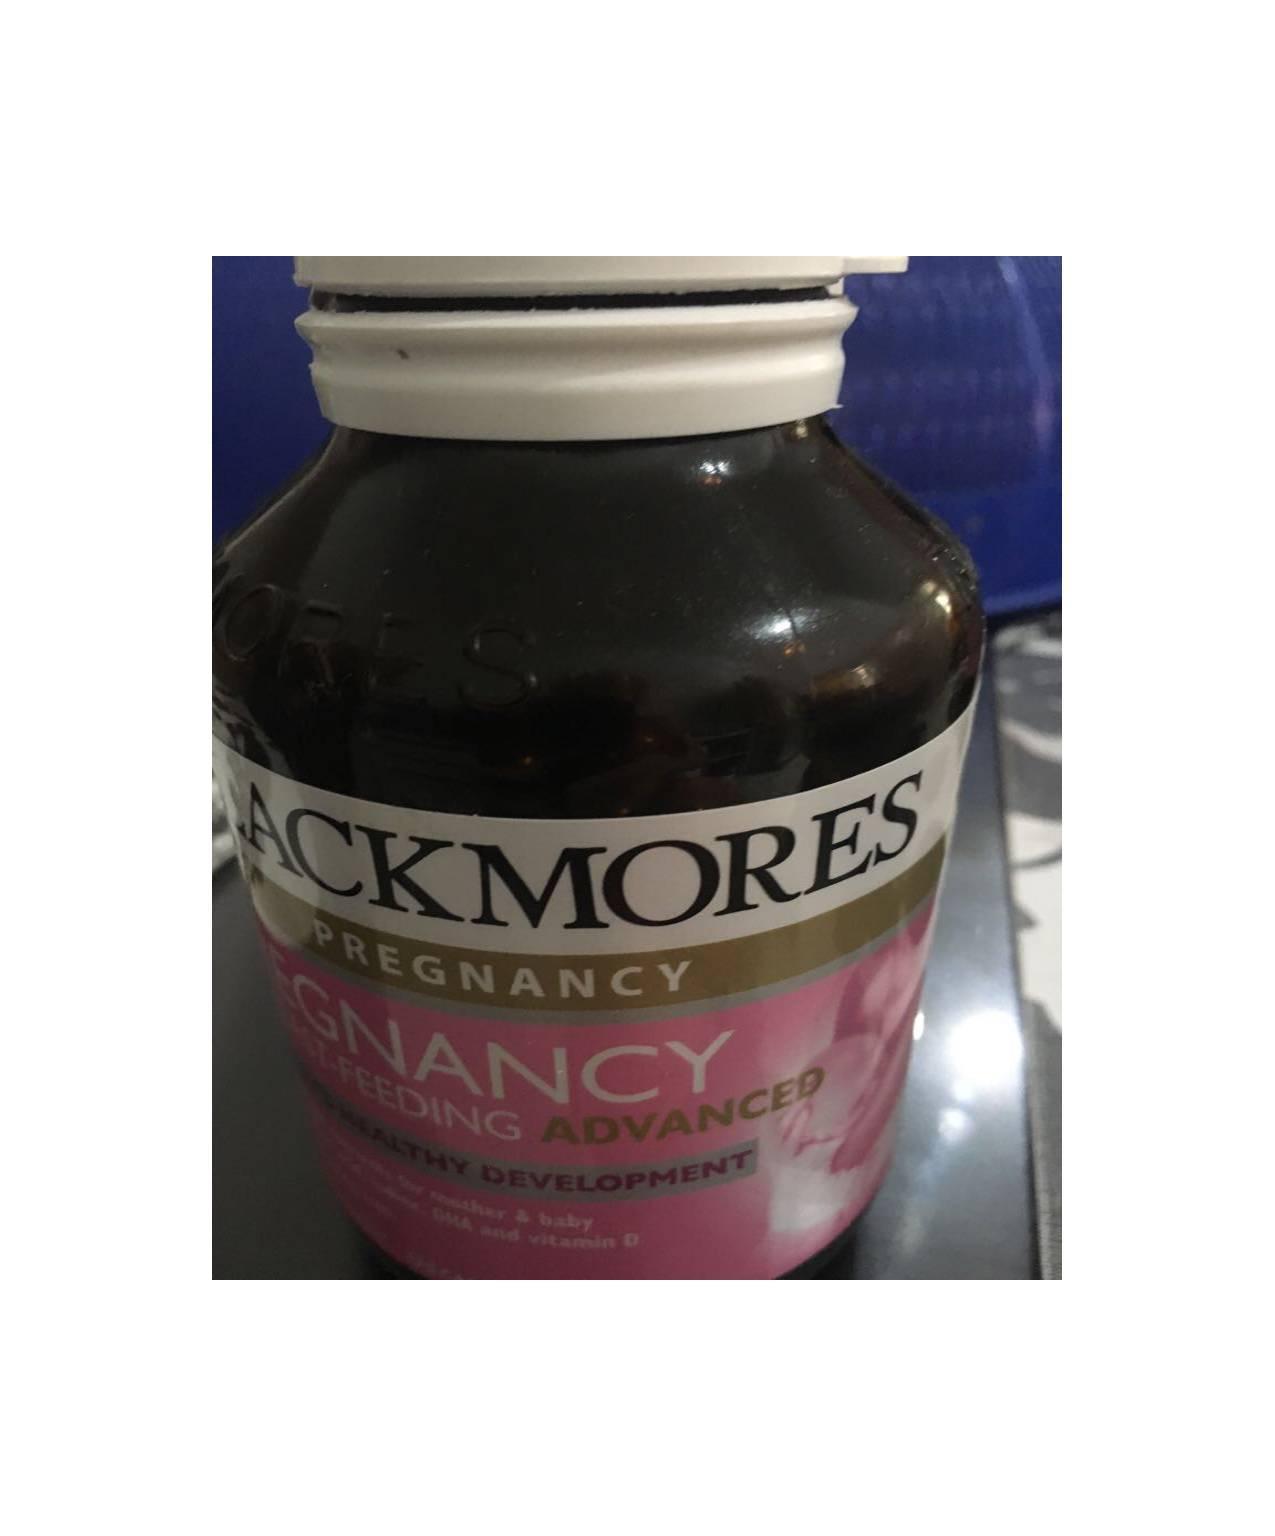 Blackmores Nature E 250iu 50 Tab Daftar Harga Terbaru Terlengkap Mens Performance Multi Tablets Pregnancy Breast Feeding Advanced